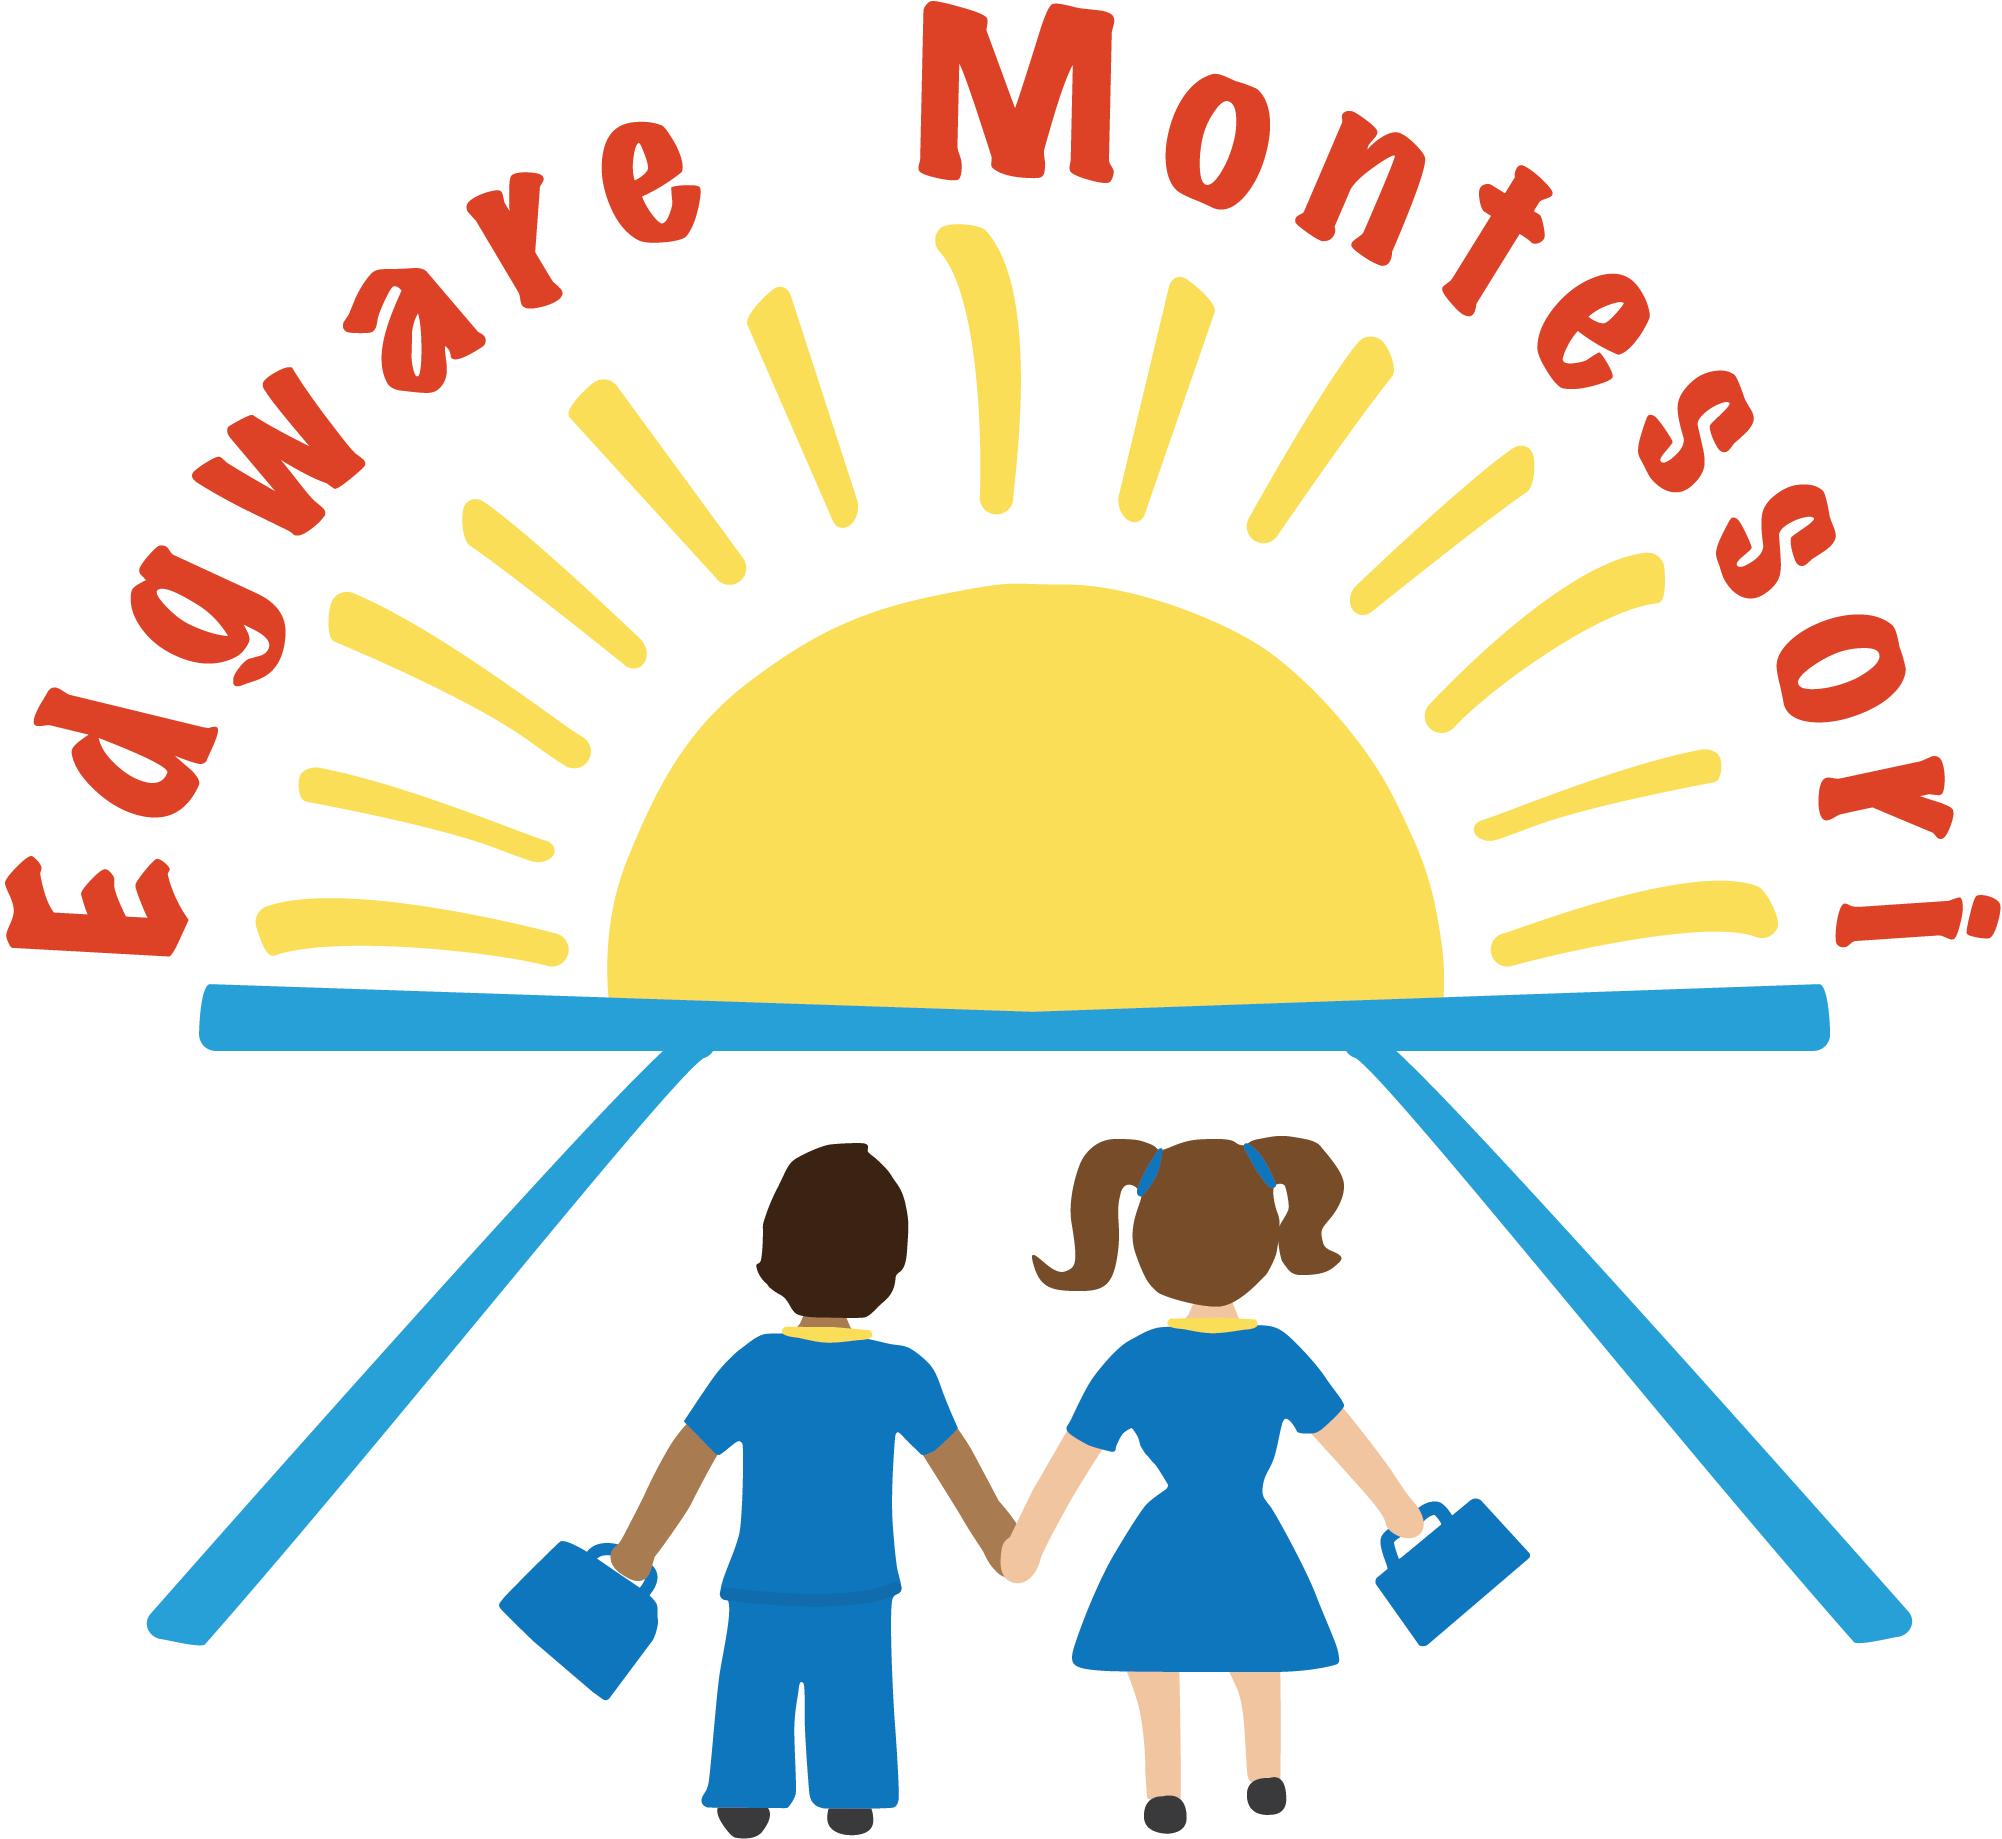 Inspire Montessori (Edgware), Advanced Apprenticeship in Children and Young Peoples Workforce